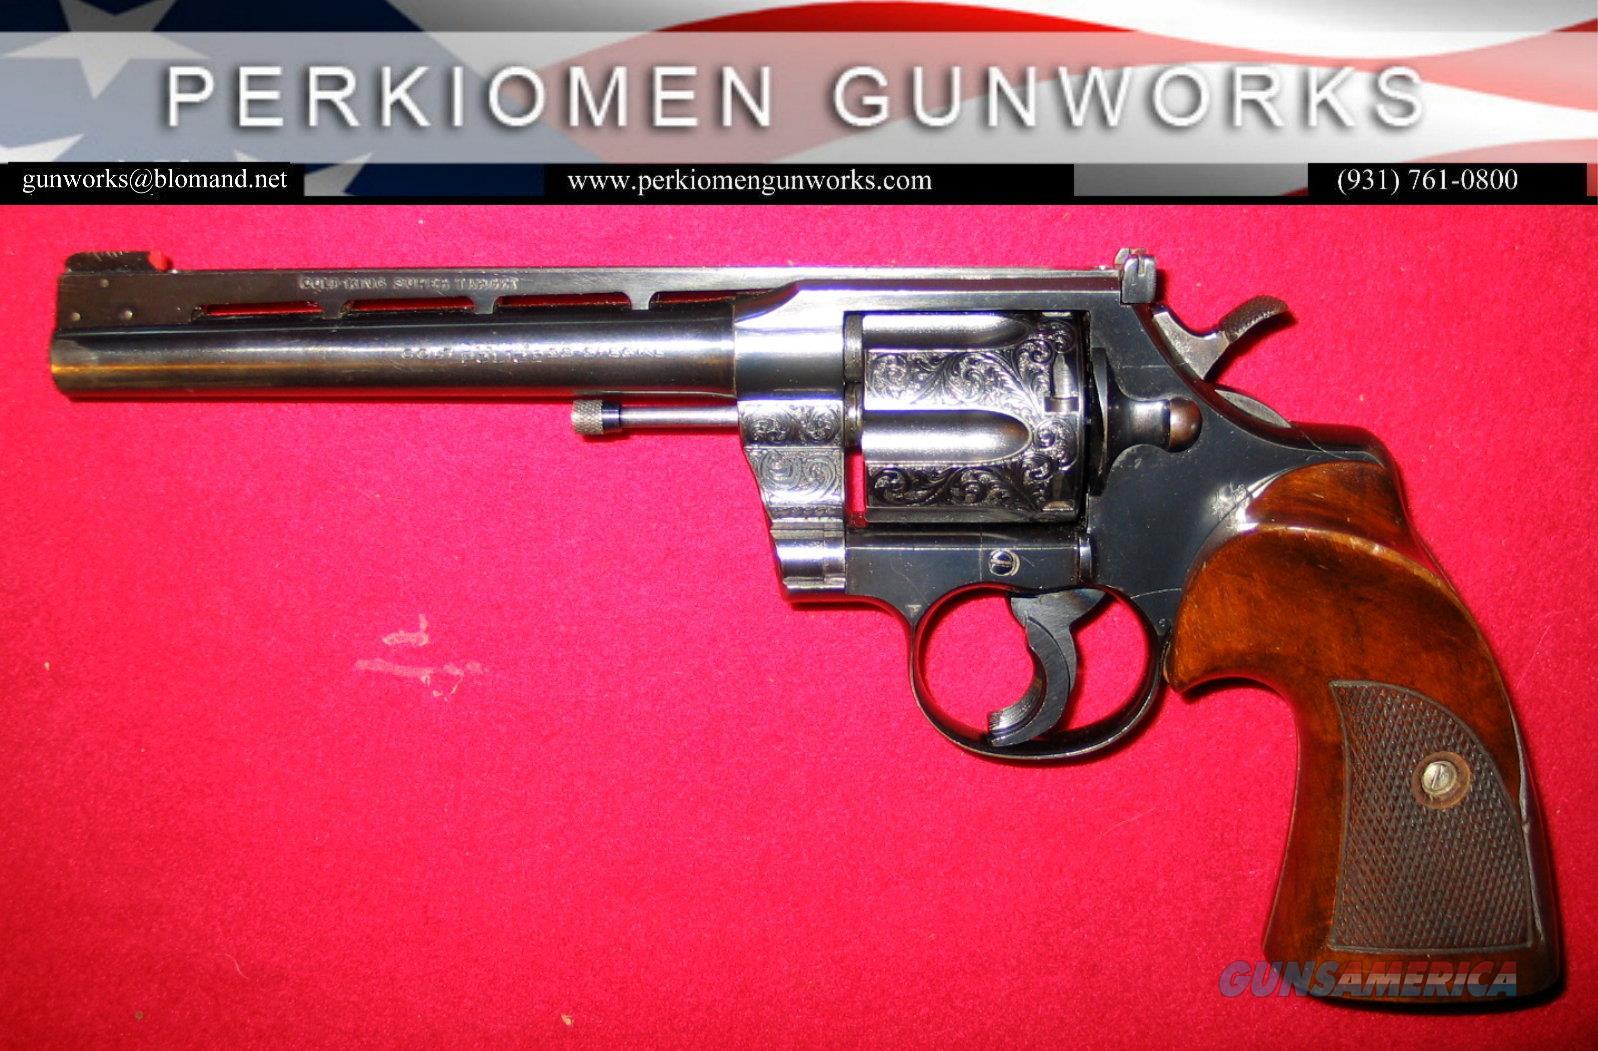 King Super Target Official Police Model .38 Special - Engraved  Guns > Pistols > Colt Double Action Revolvers- Modern